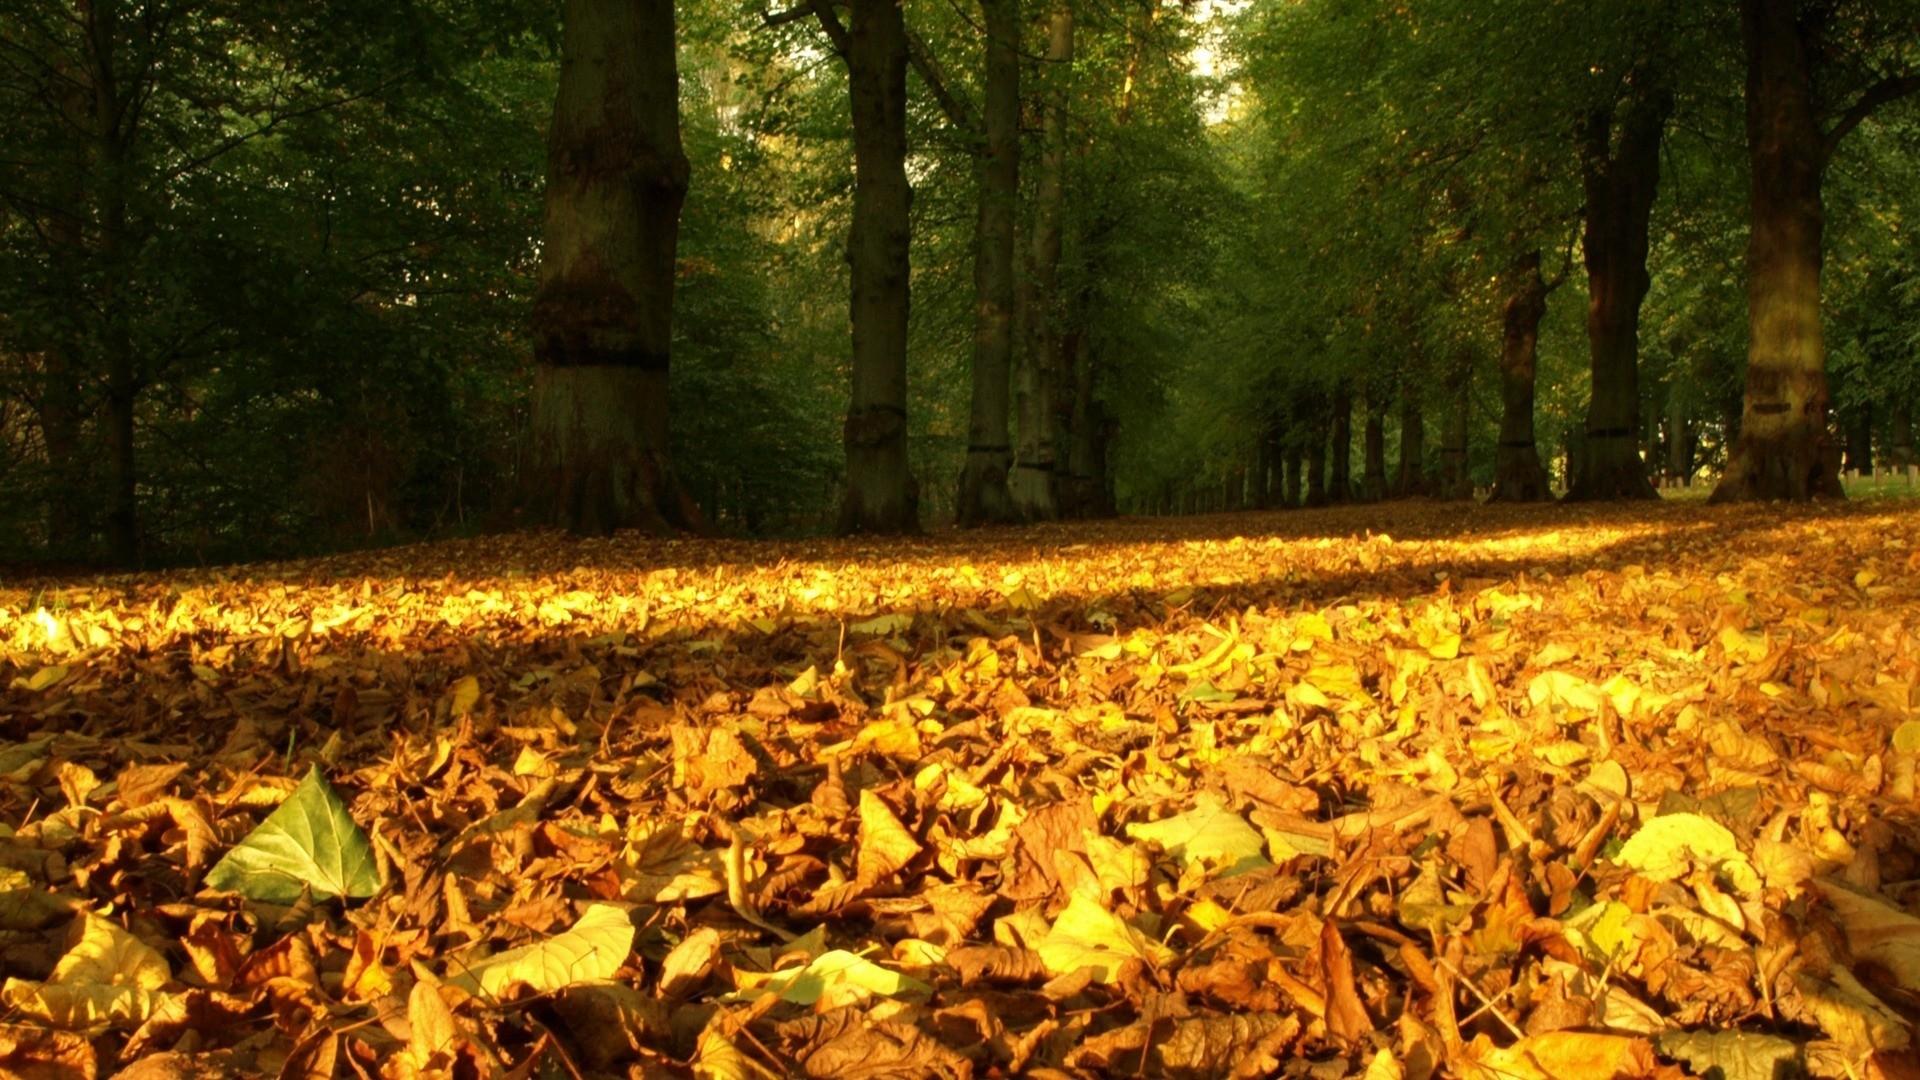 autumn wallpaper leaves